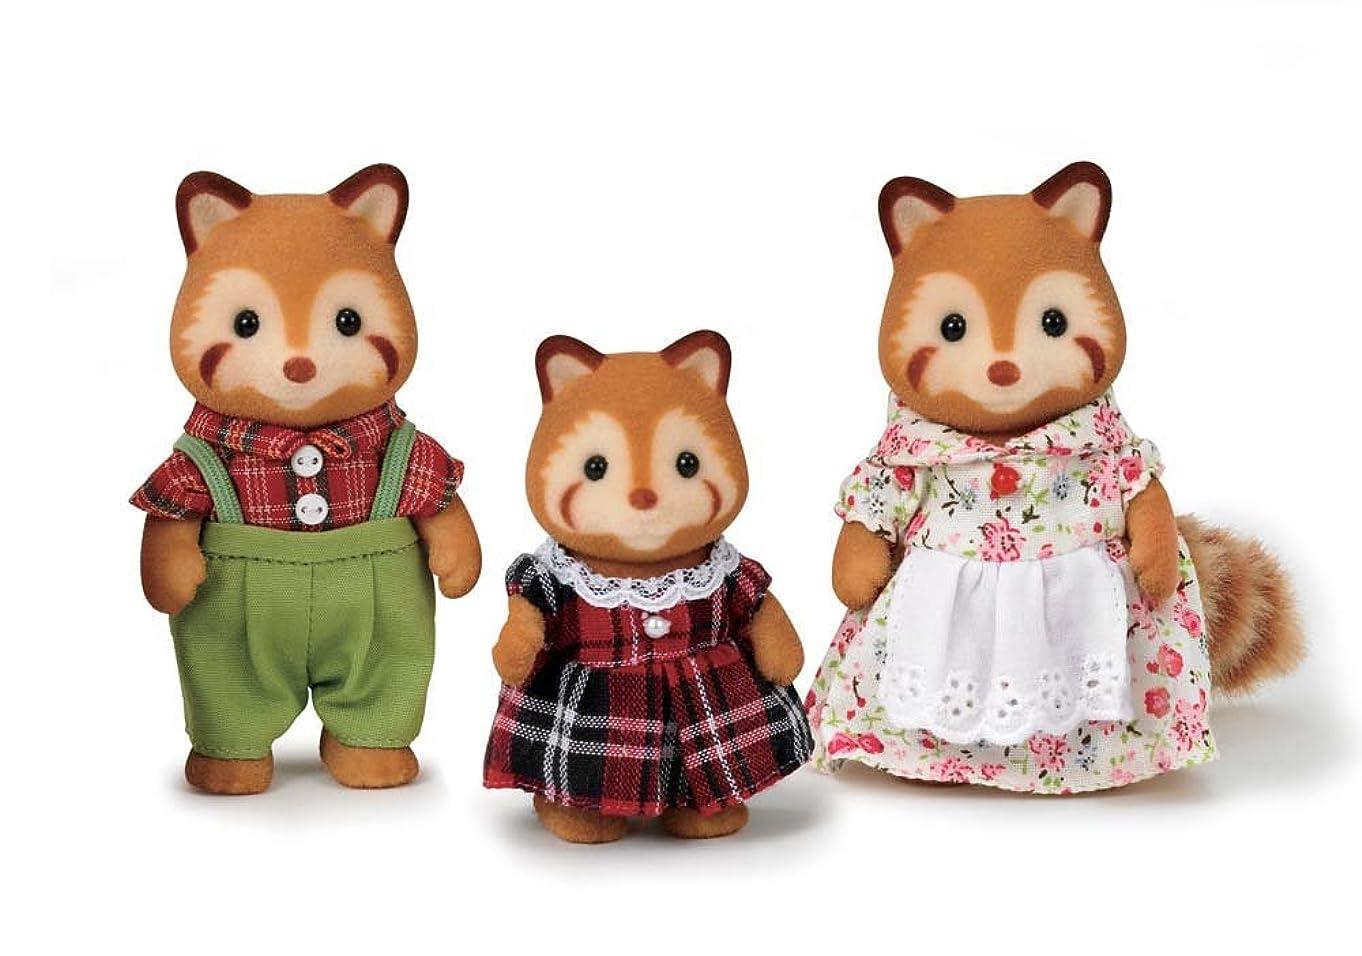 Calico Critters Red Panda Family u94172716